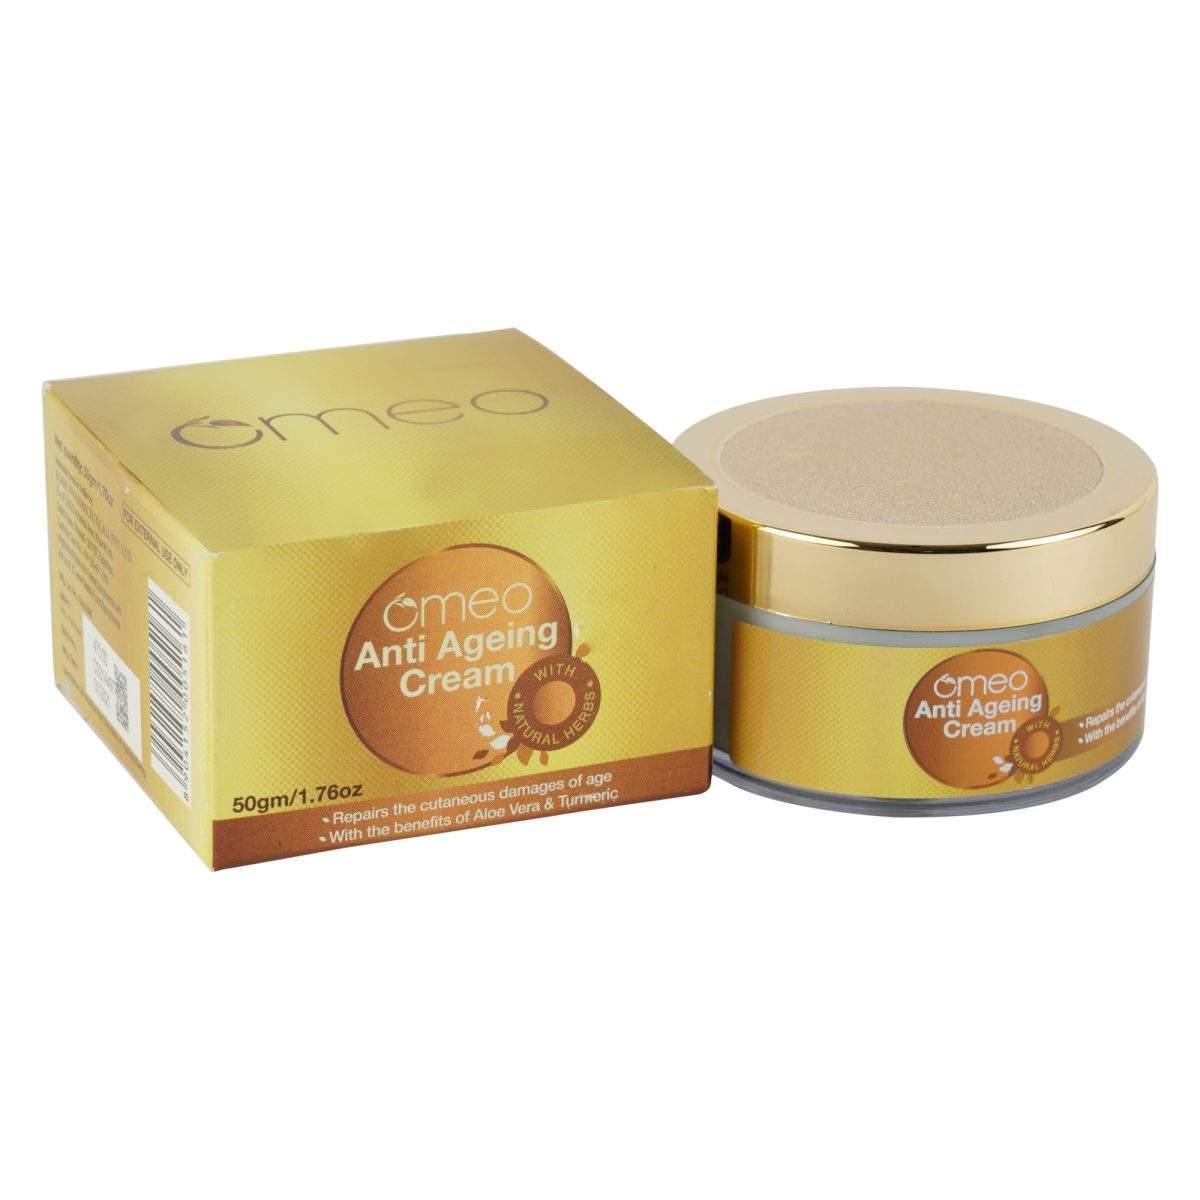 Omeo Anti Ageing Cream